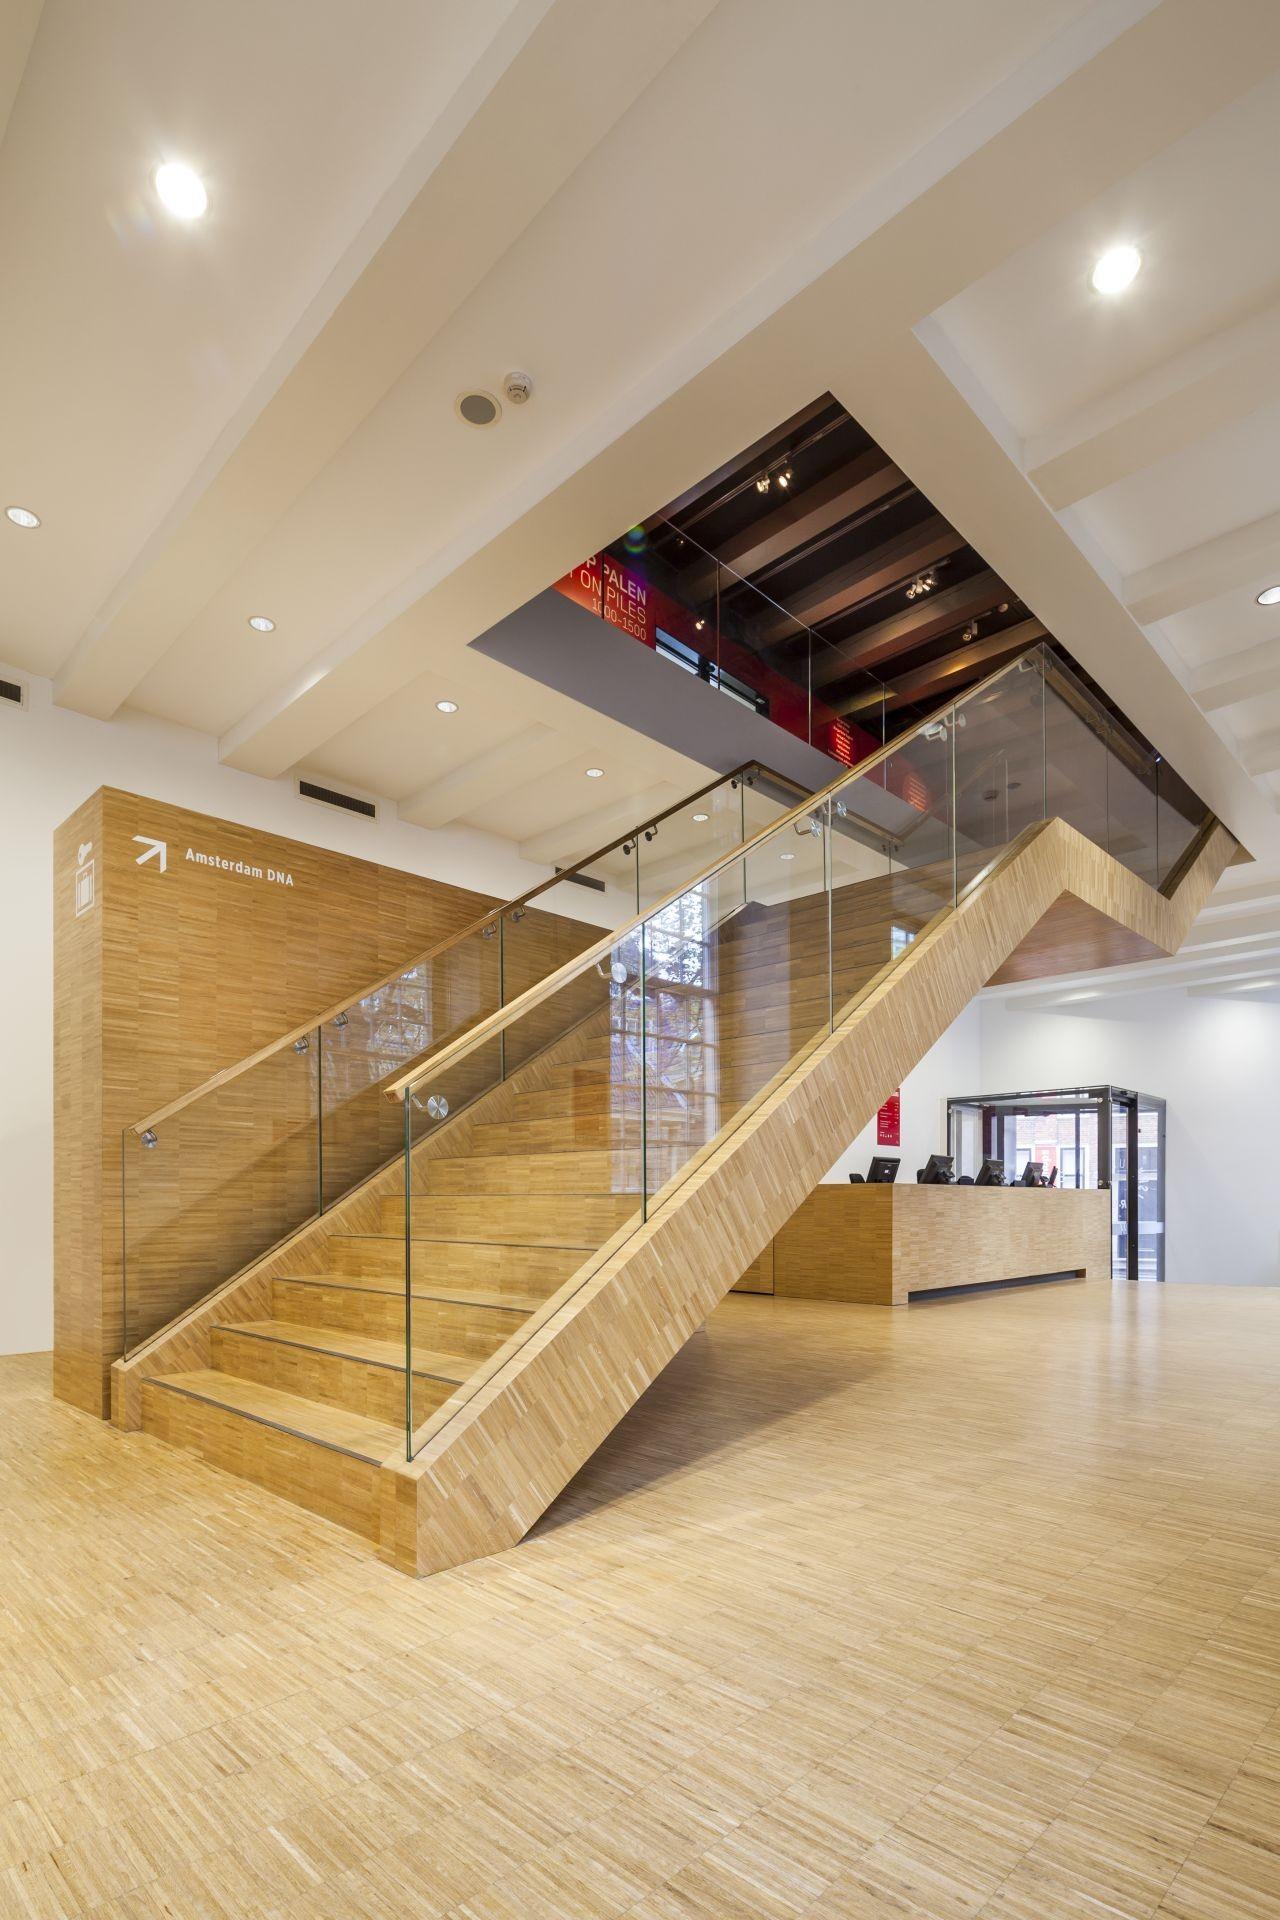 Galería de Amsterdam Museum / Benthem Crouwel Architekten - 3